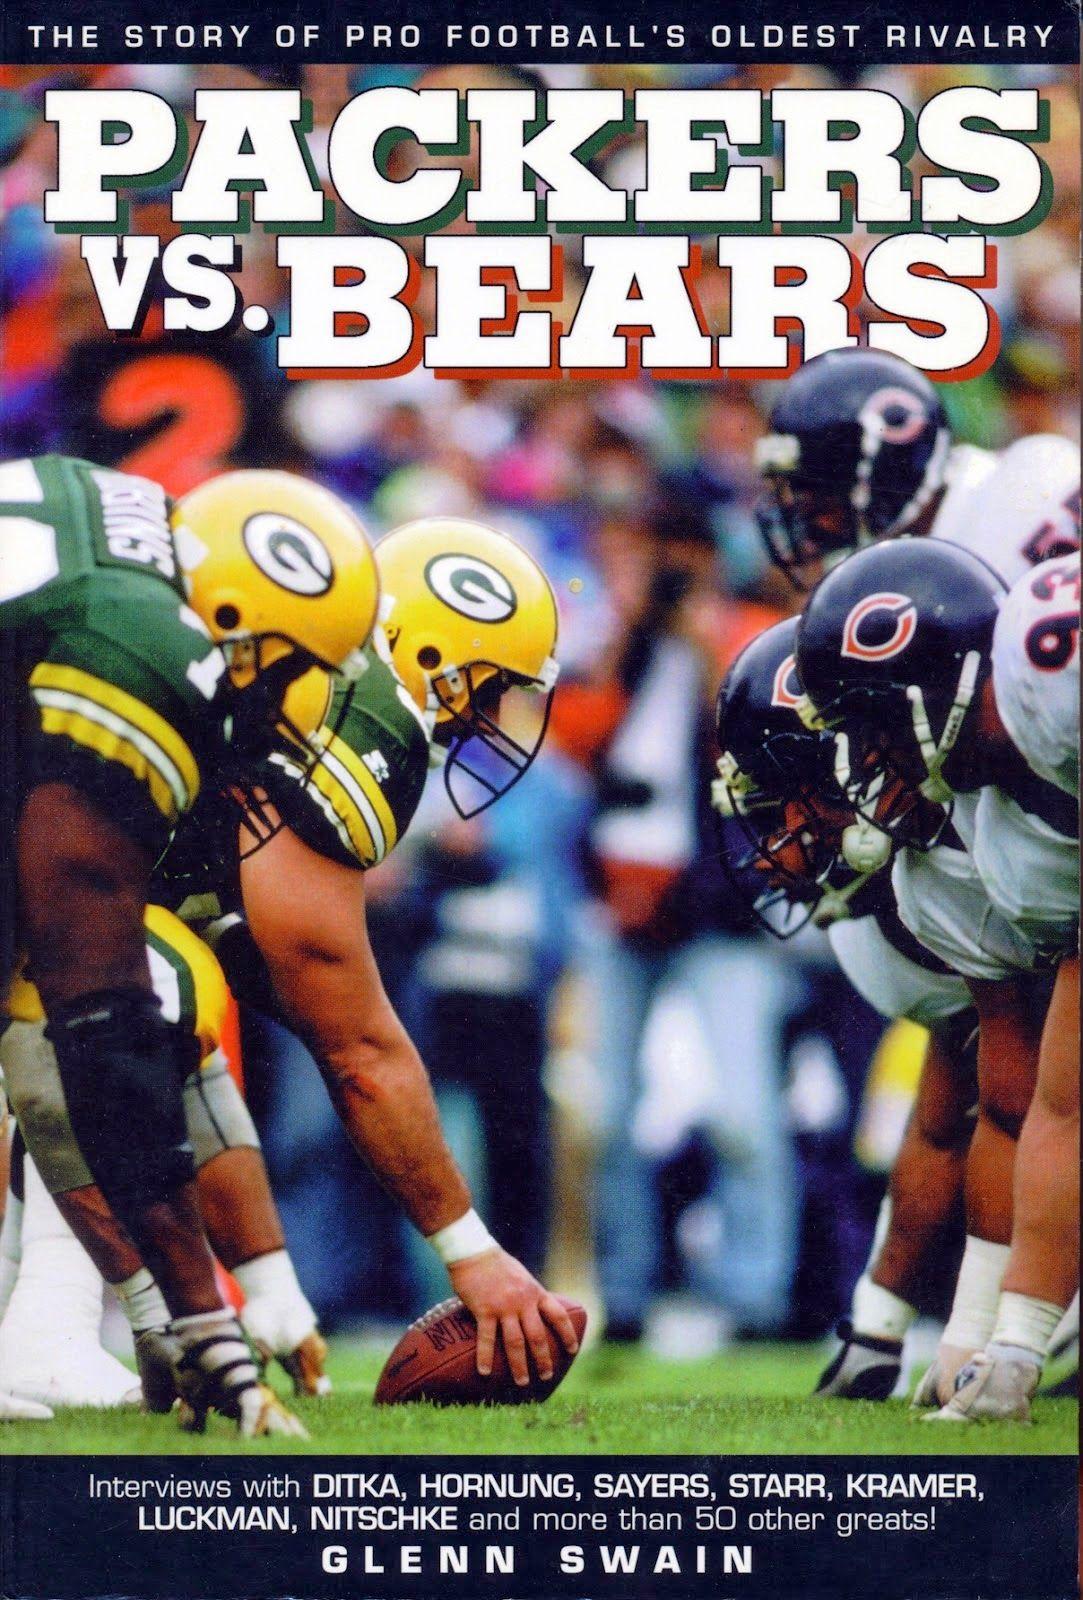 Nfl Cast Watch Green Bay Packers Vs Chicago Bears Live Stream Vidzone24 Http Www Vidzo Green Bay Packers Vs Chicago Bears Packers Stream Nfl